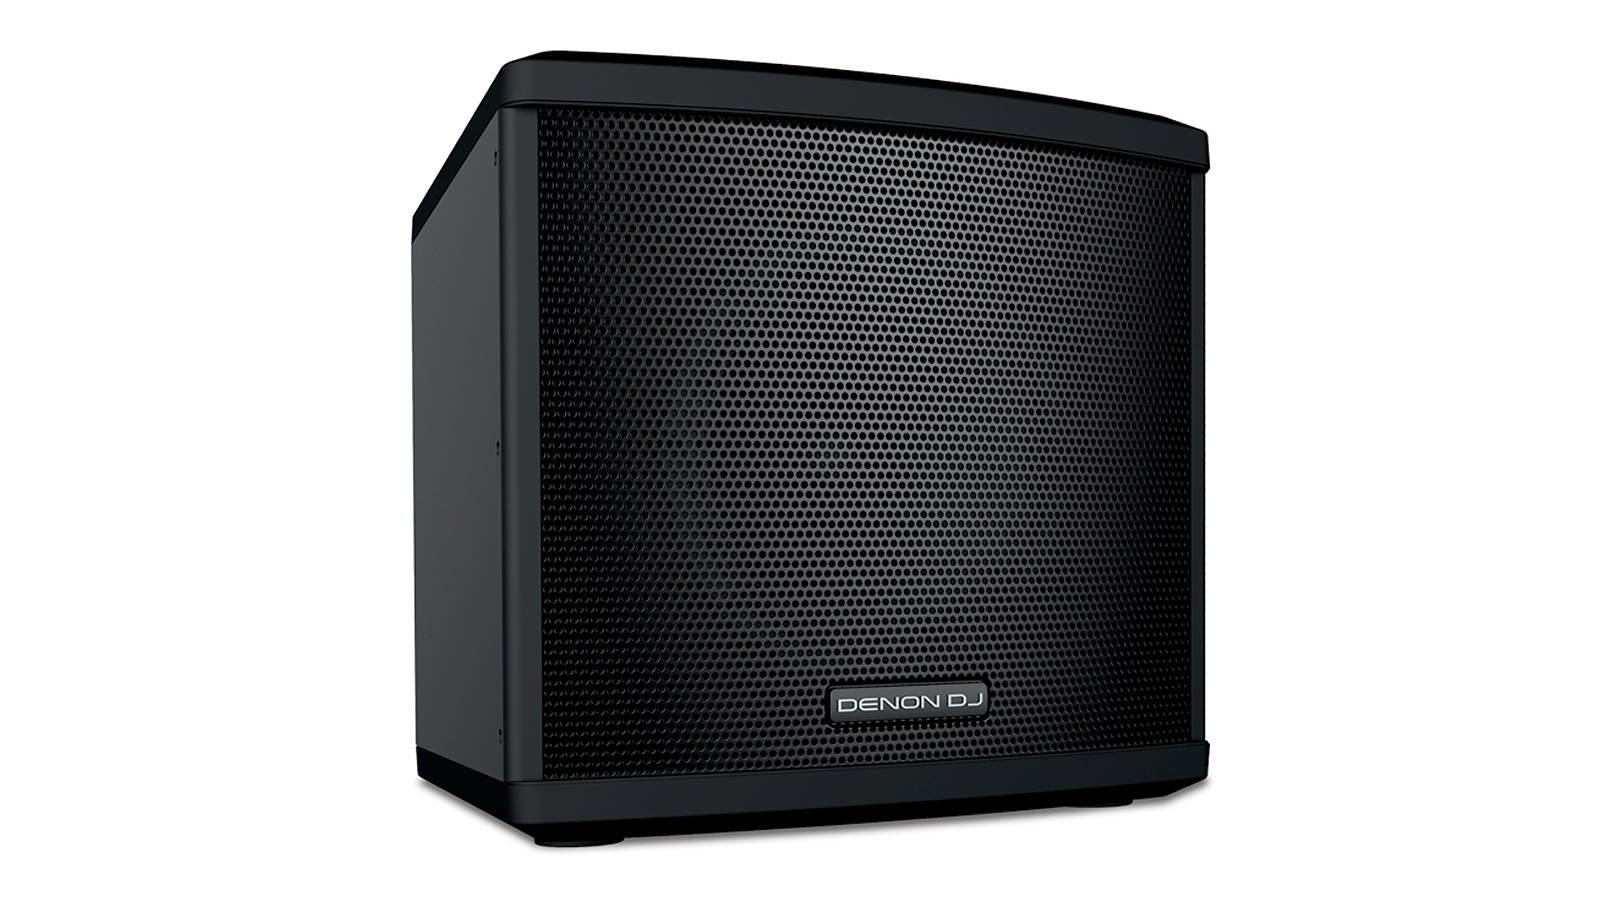 DenonDJ AXIS 8 Aktives 8-Zoll Zwei-Wege Koaxial Lautsprechersystem